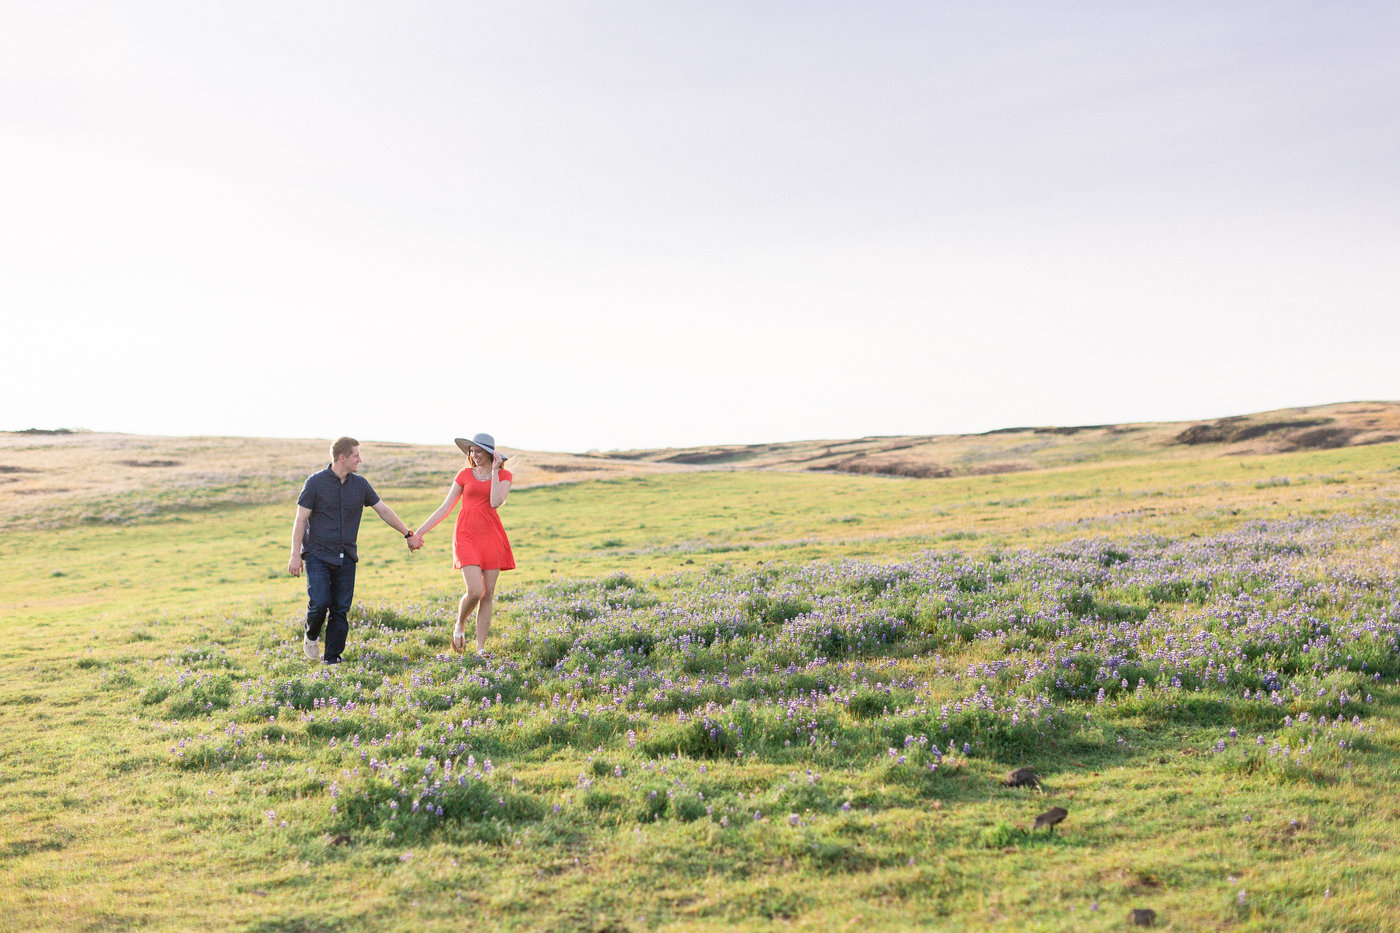 Spring-engagment-photo-sessionpg